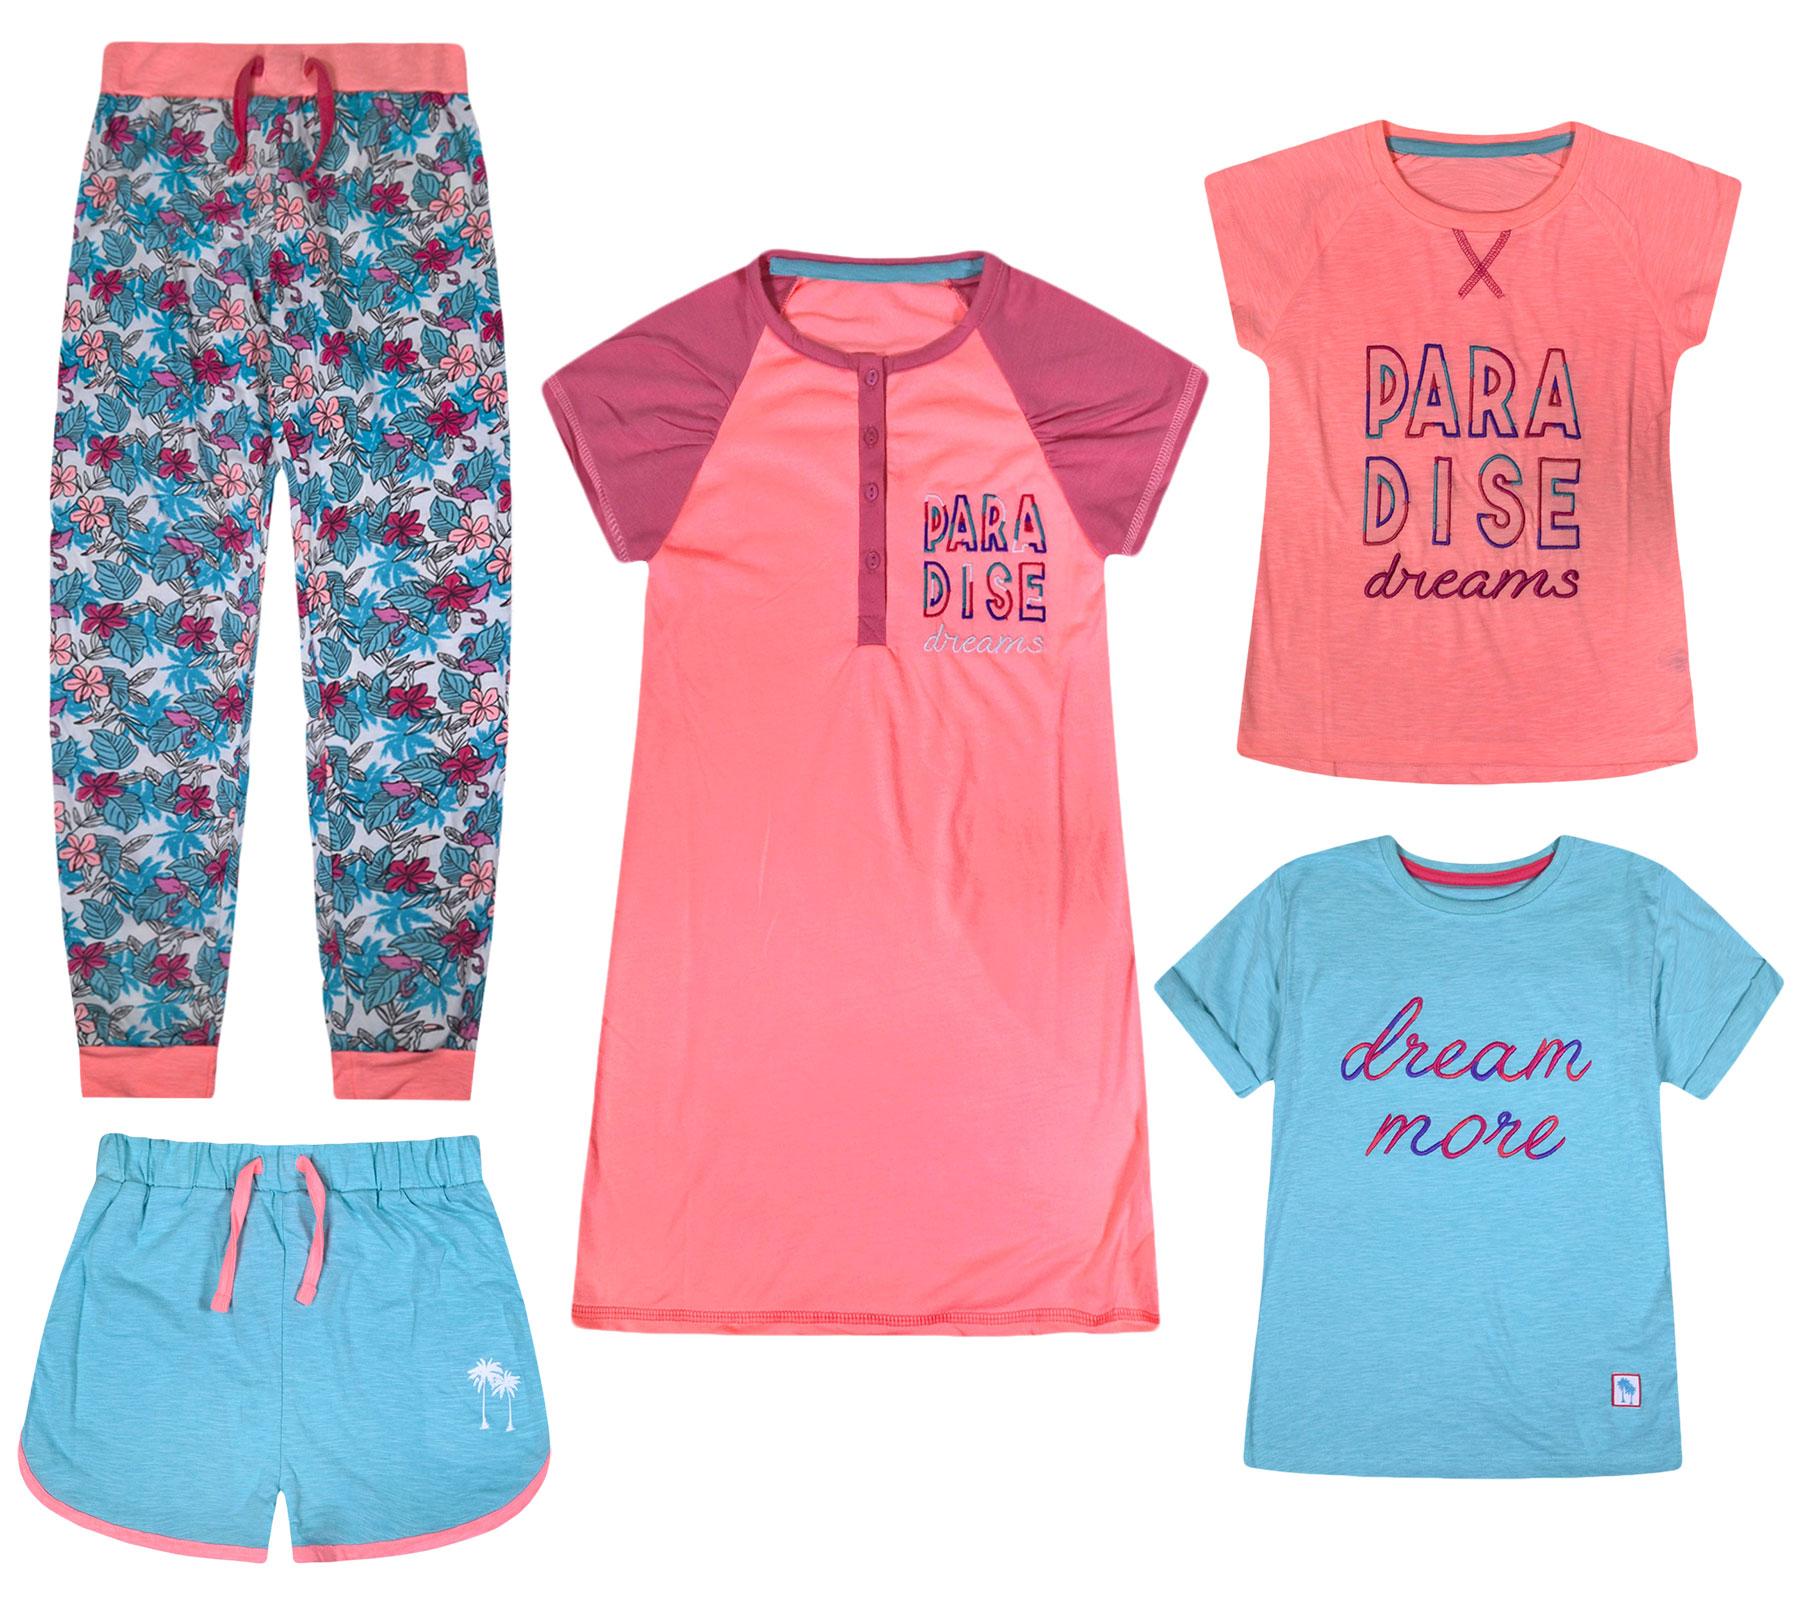 Machine Washable Graphic Short Length jolly rascals Girls Pyjama Shorts in Cotton Blend